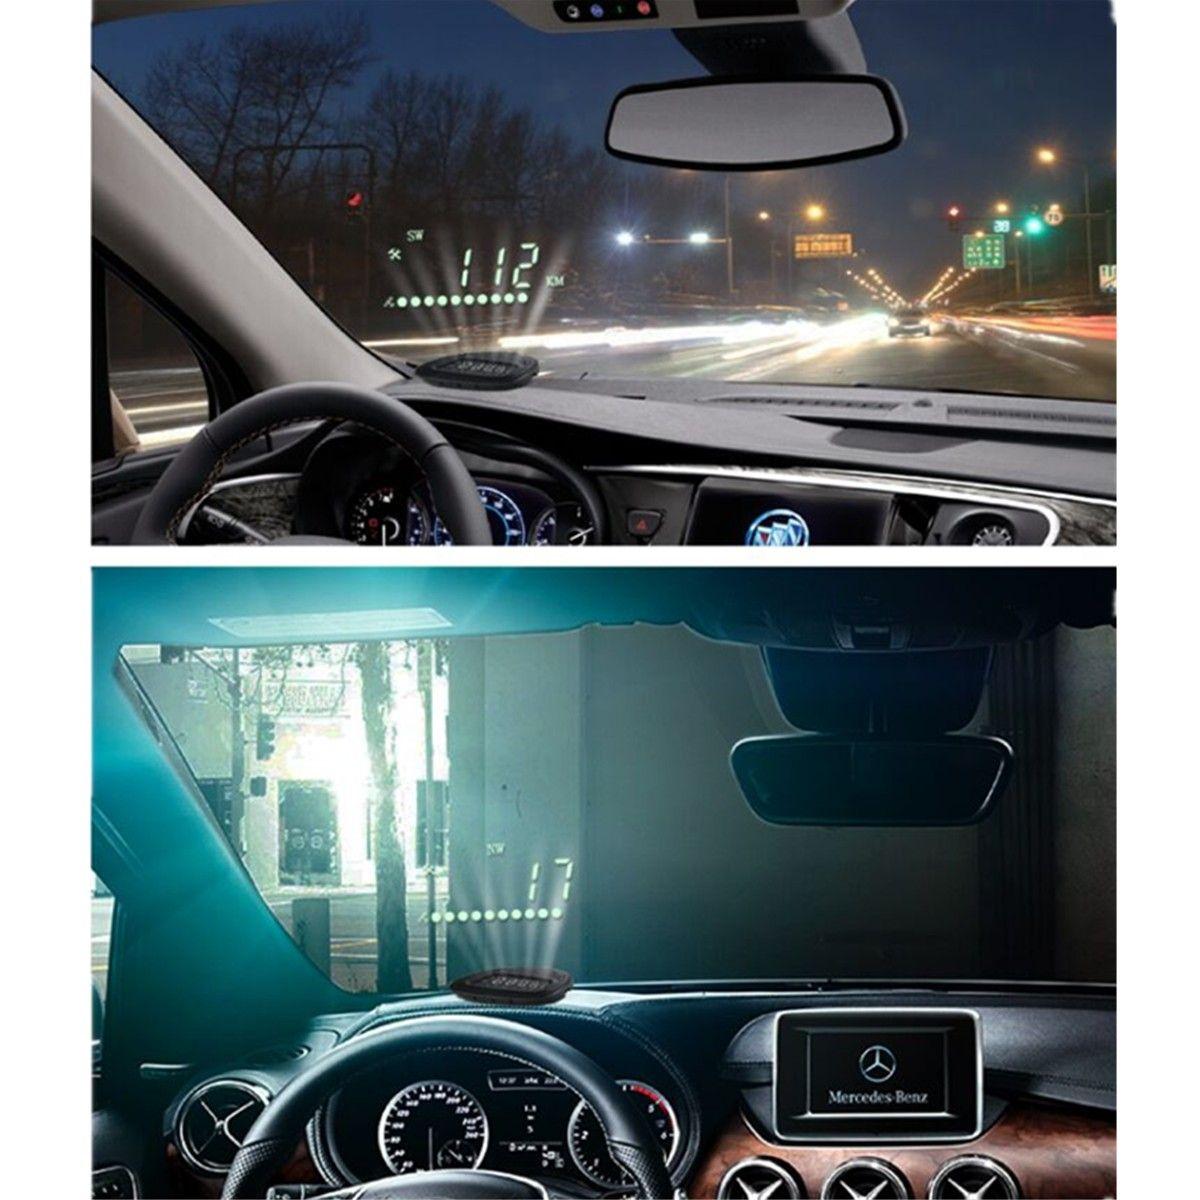 Worldwide universal hud 2 0 inch a1 gps car head up display speedometers dashboard driving time kilometers